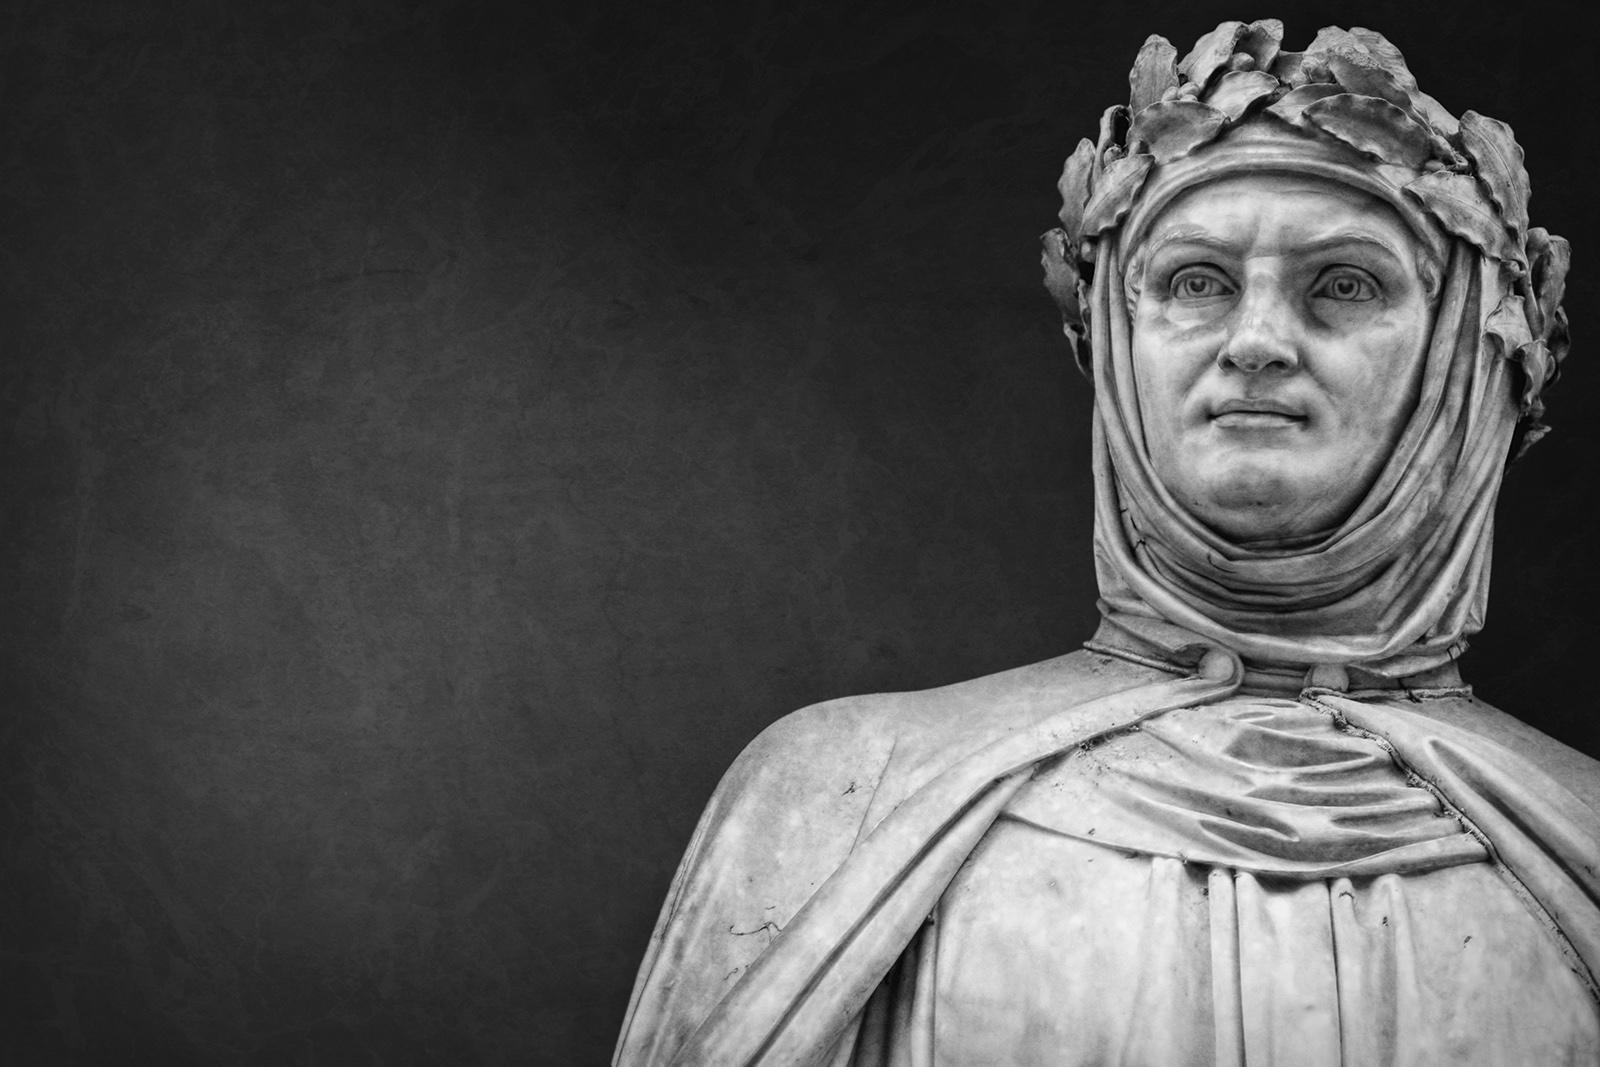 Skulptur des italienischen Dichters Giovanni Boccaccio